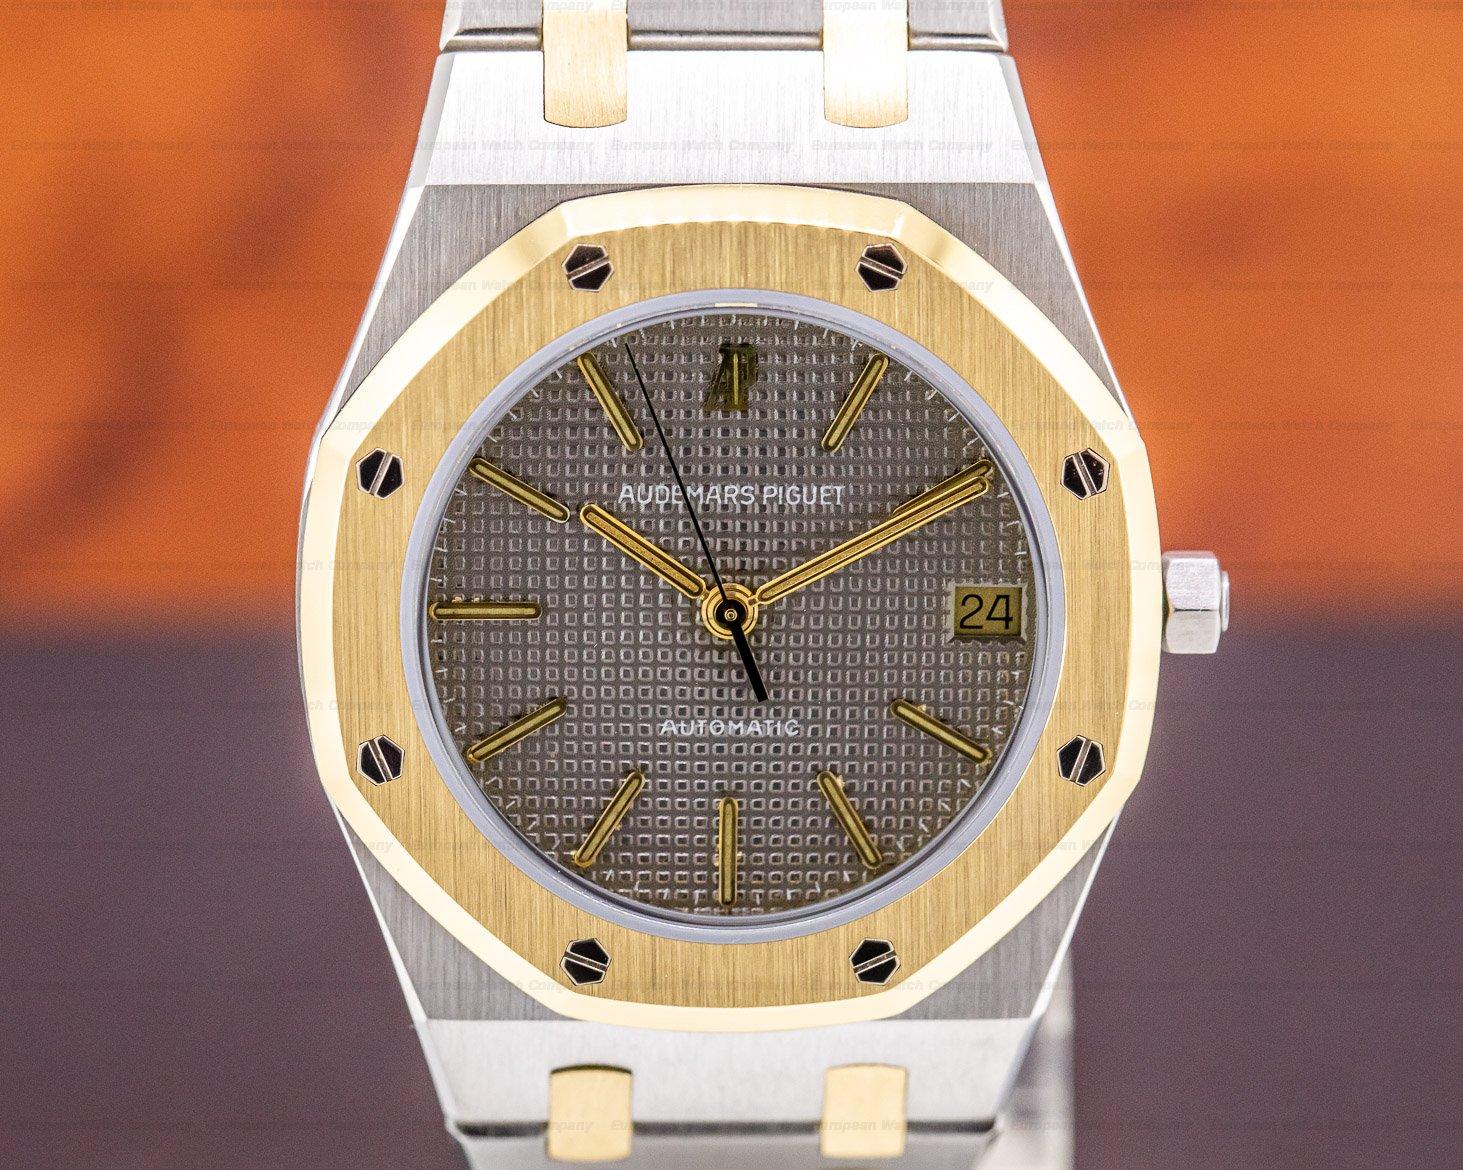 Audemars Piguet 14100SA.OO.0477SA.01 Royal Oak Automatic 18K Yellow Gold / Stainless Steel 37MM